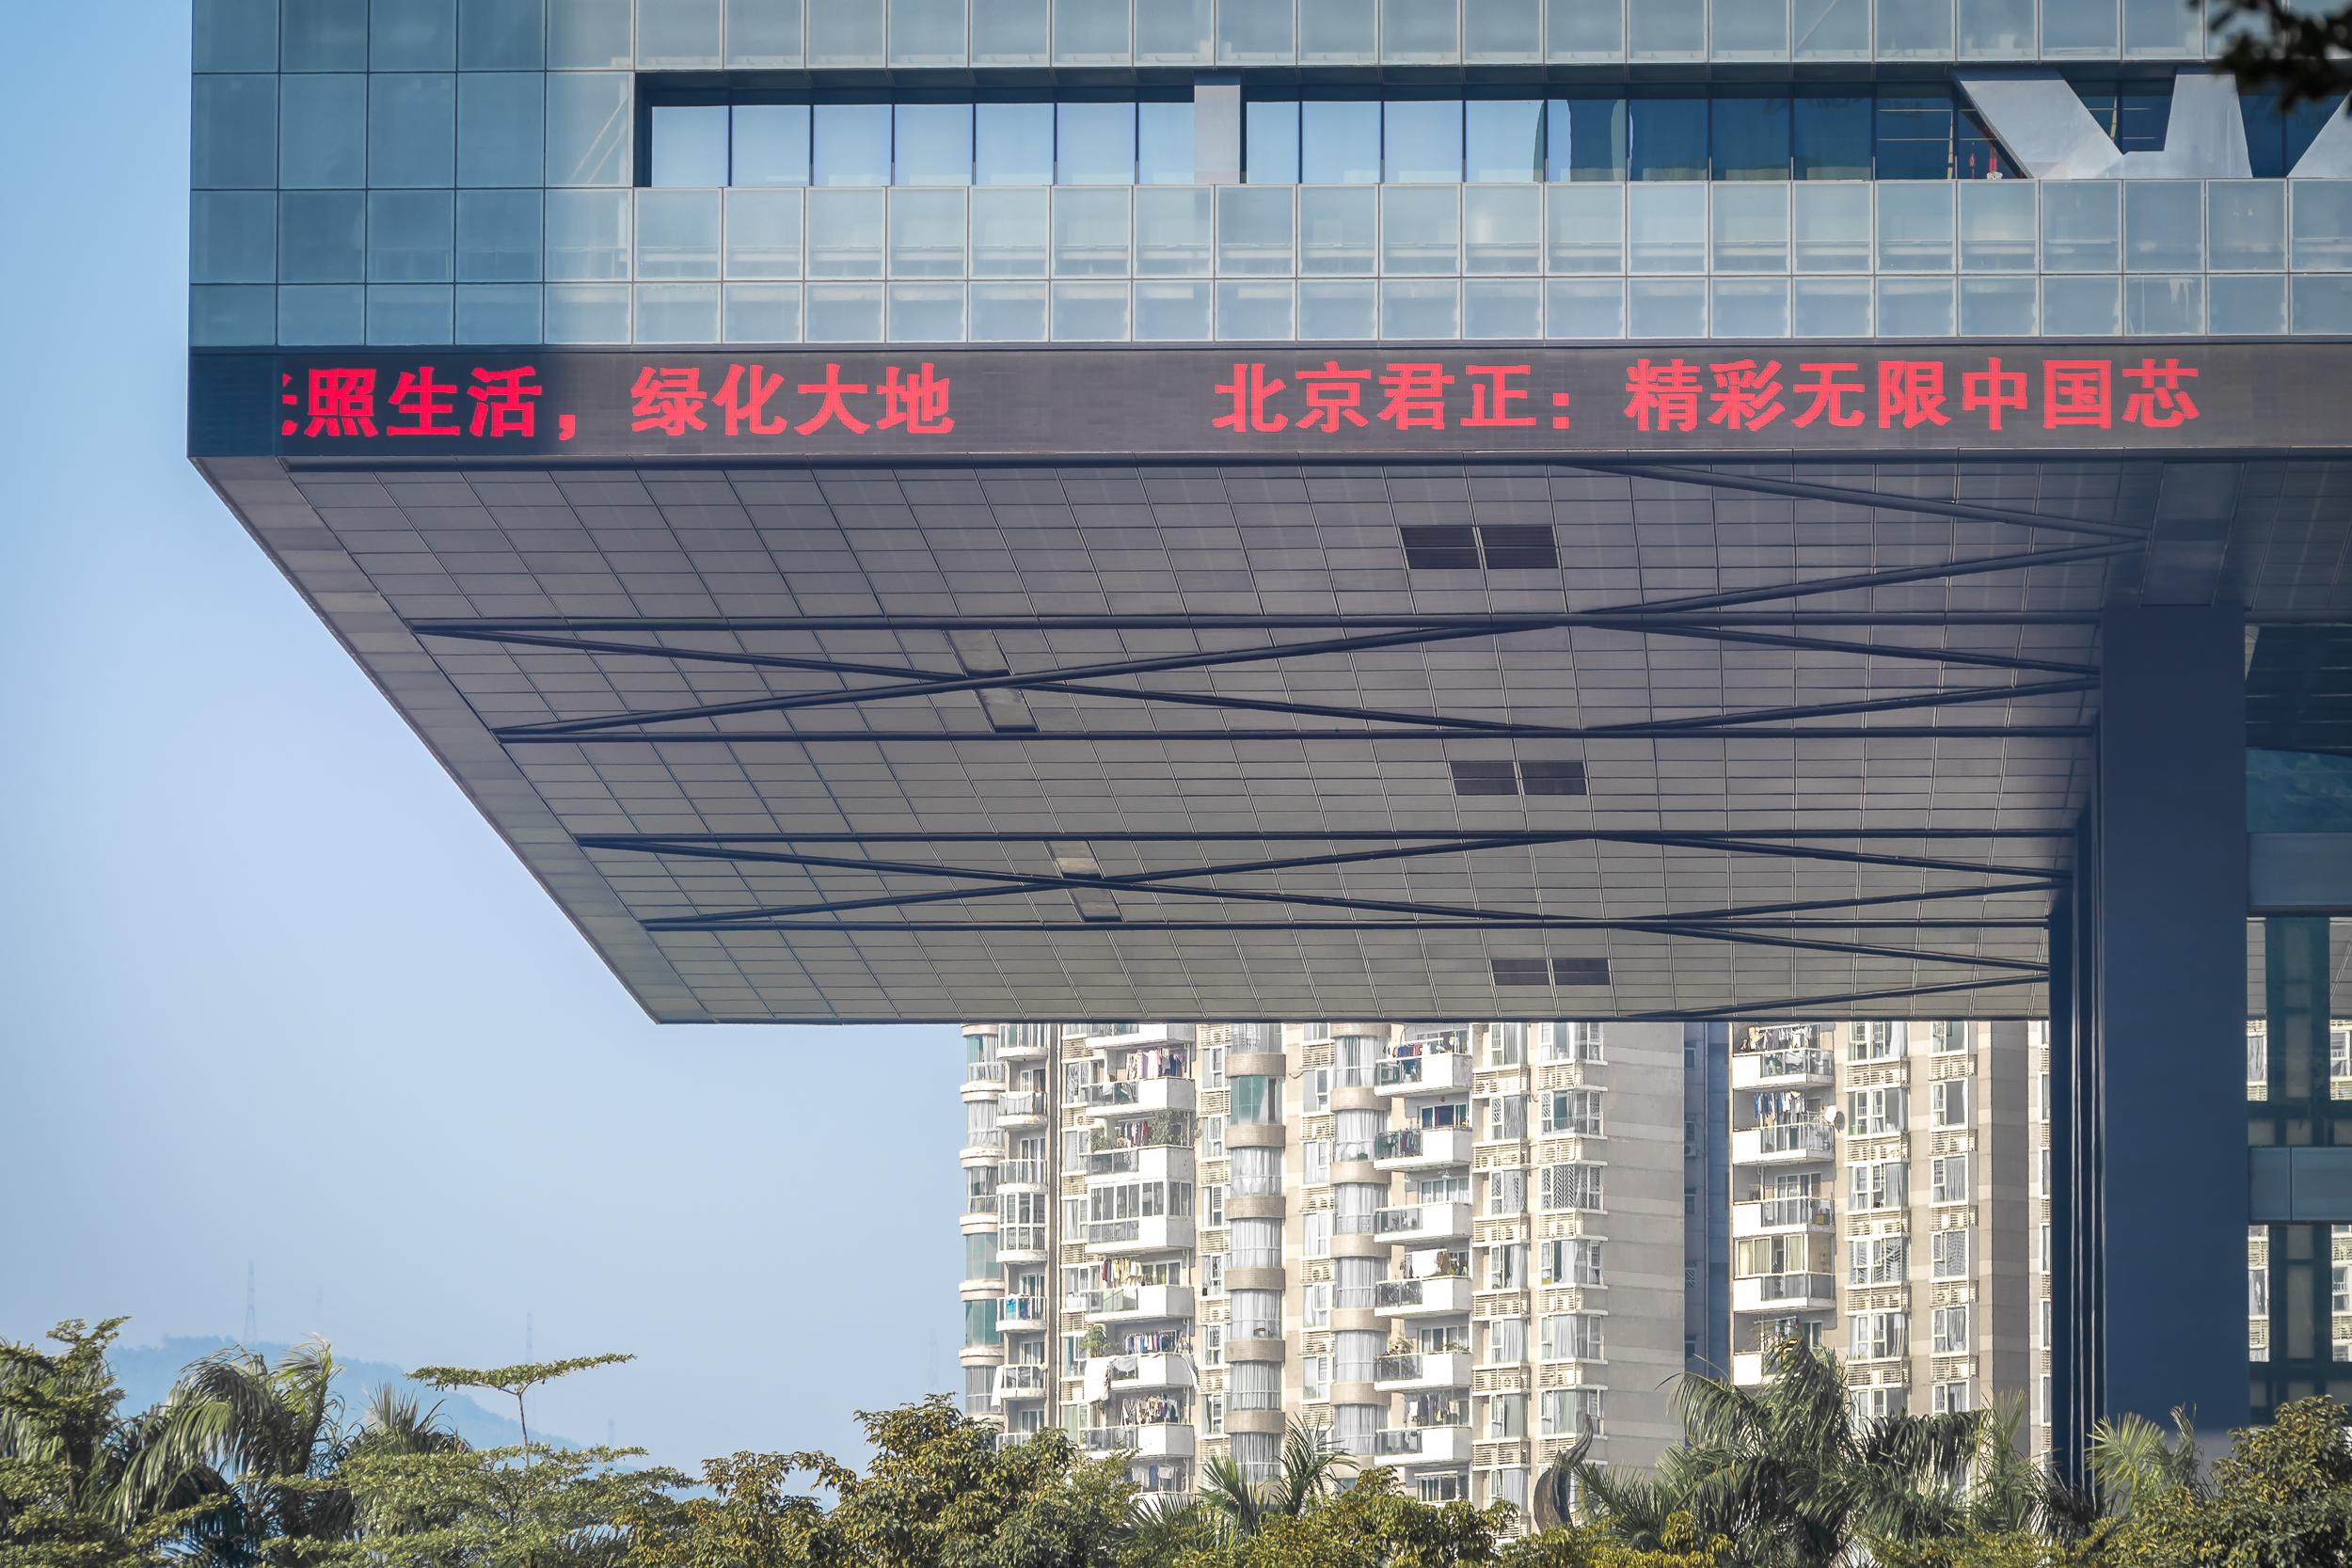 B001-SHENZHEN-STOCK-EXCHANGE-CHINA-OMA-深圳证券交易所-by-Sebastian-Loaiza-www.sebloaiza.com-2500px-Web-5.jpg